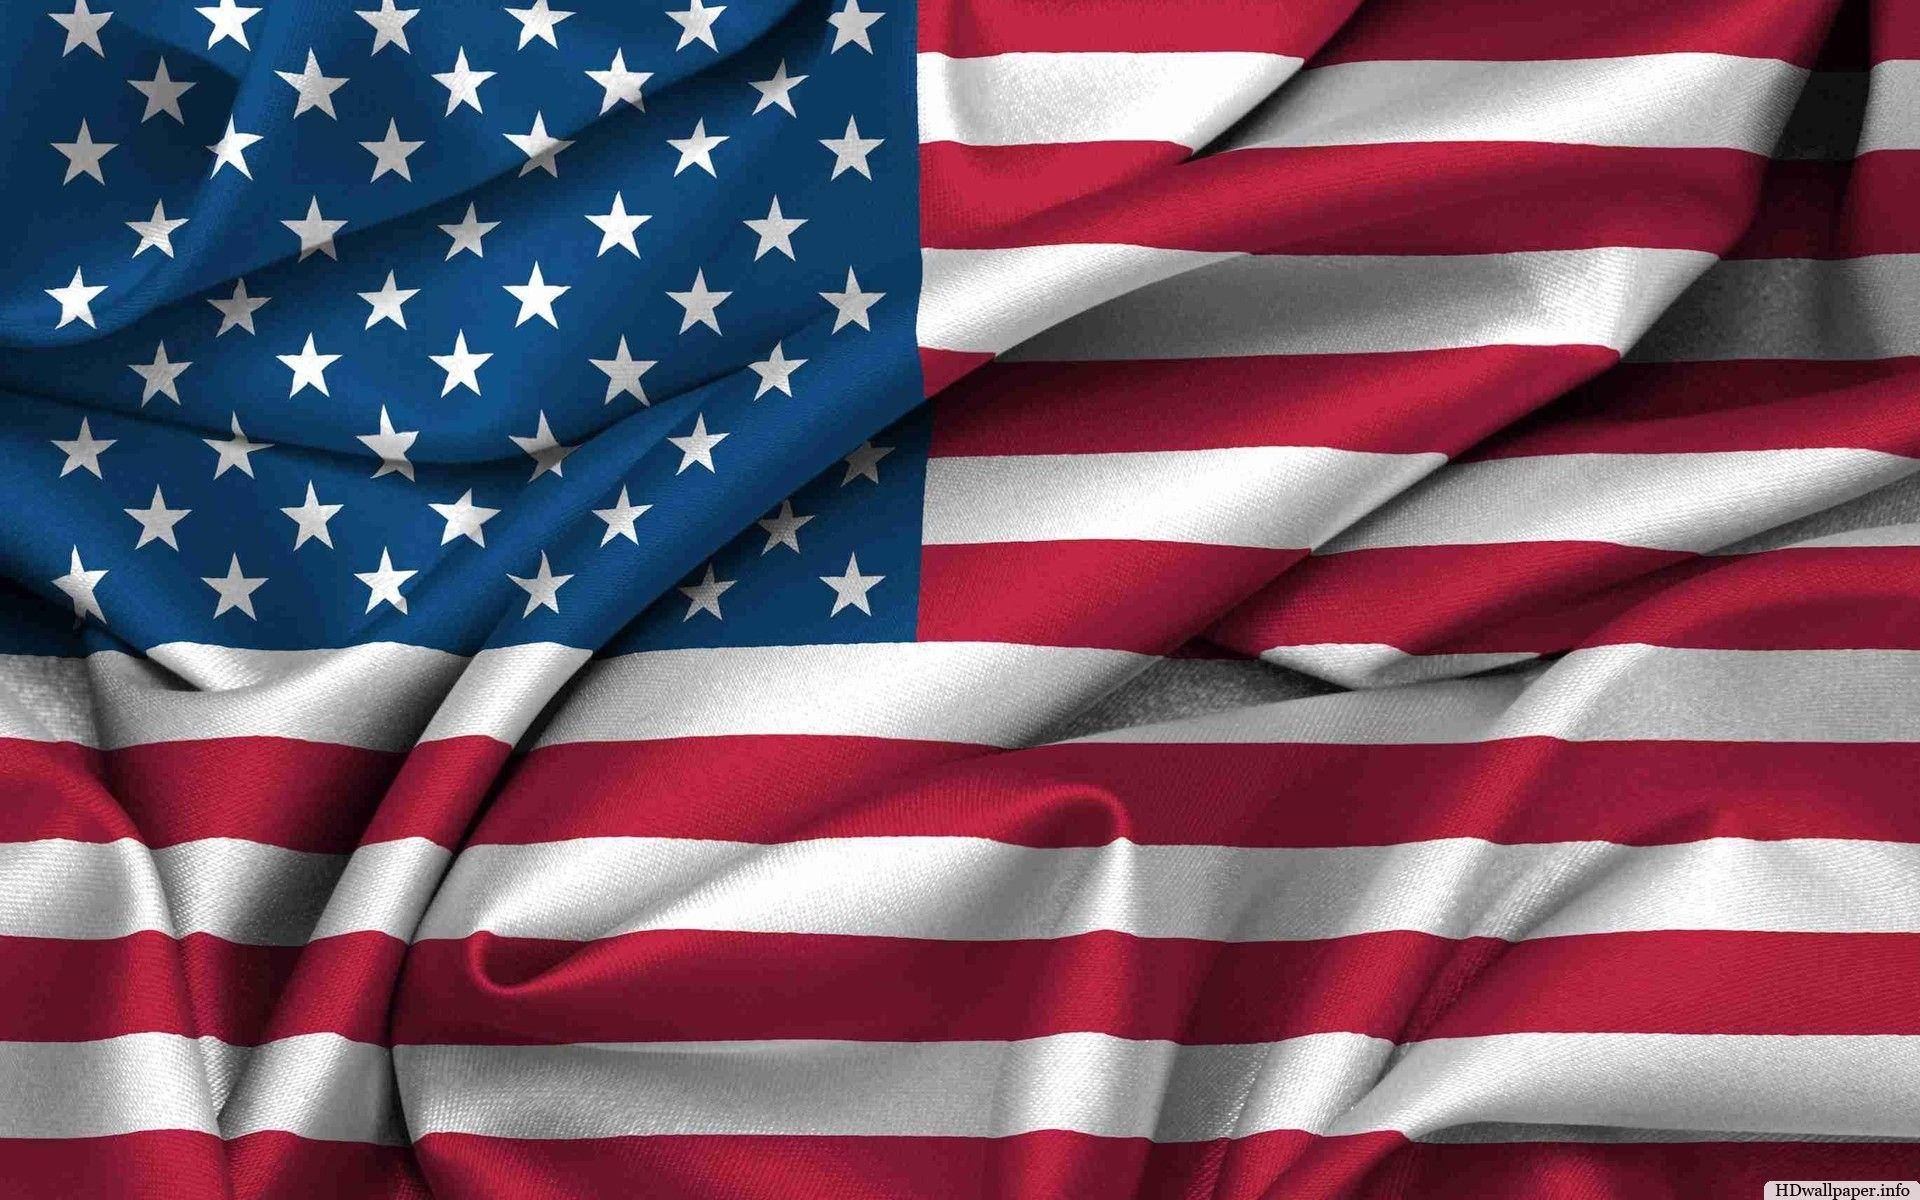 Beautiful U.s. Flag Hd Wallpaper   Http://hdwallpaper.info/u S Flag Hd Wallpaper/ HD  Wallpapers